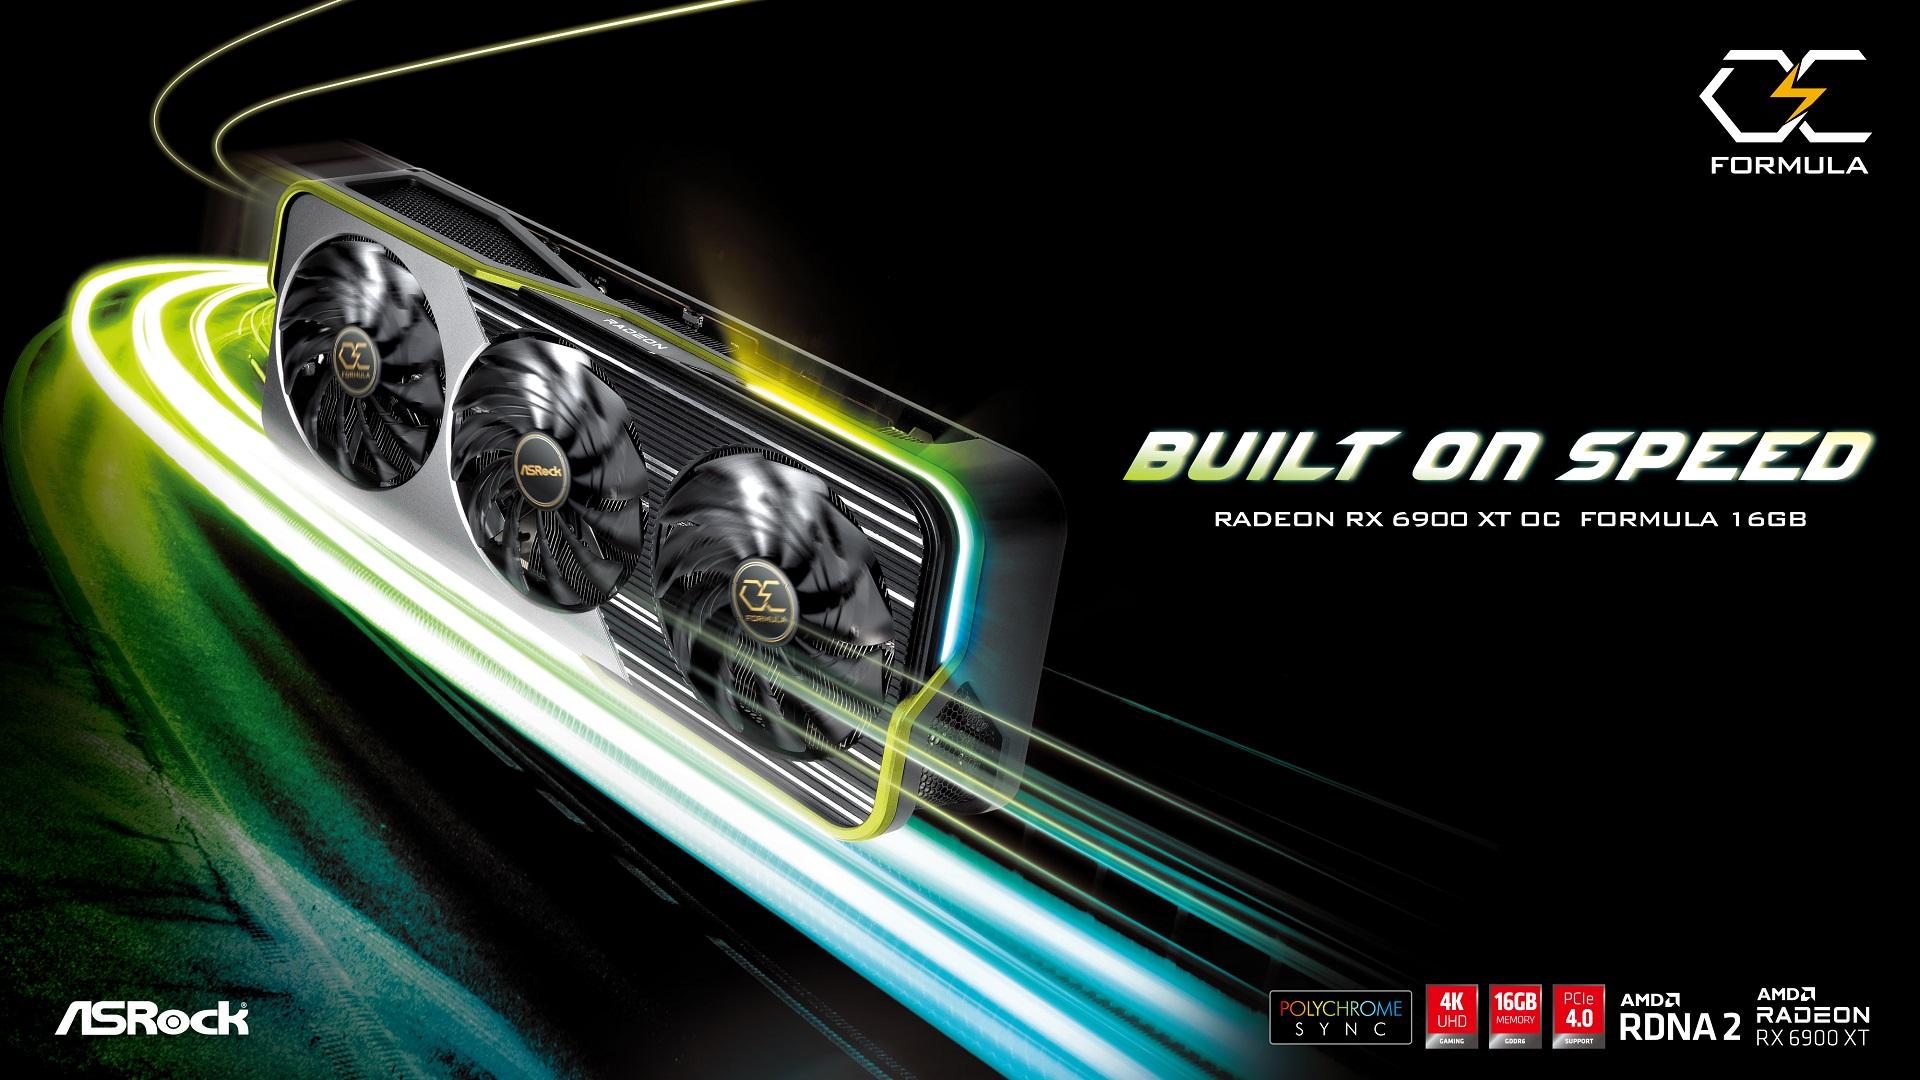 Built on Speed